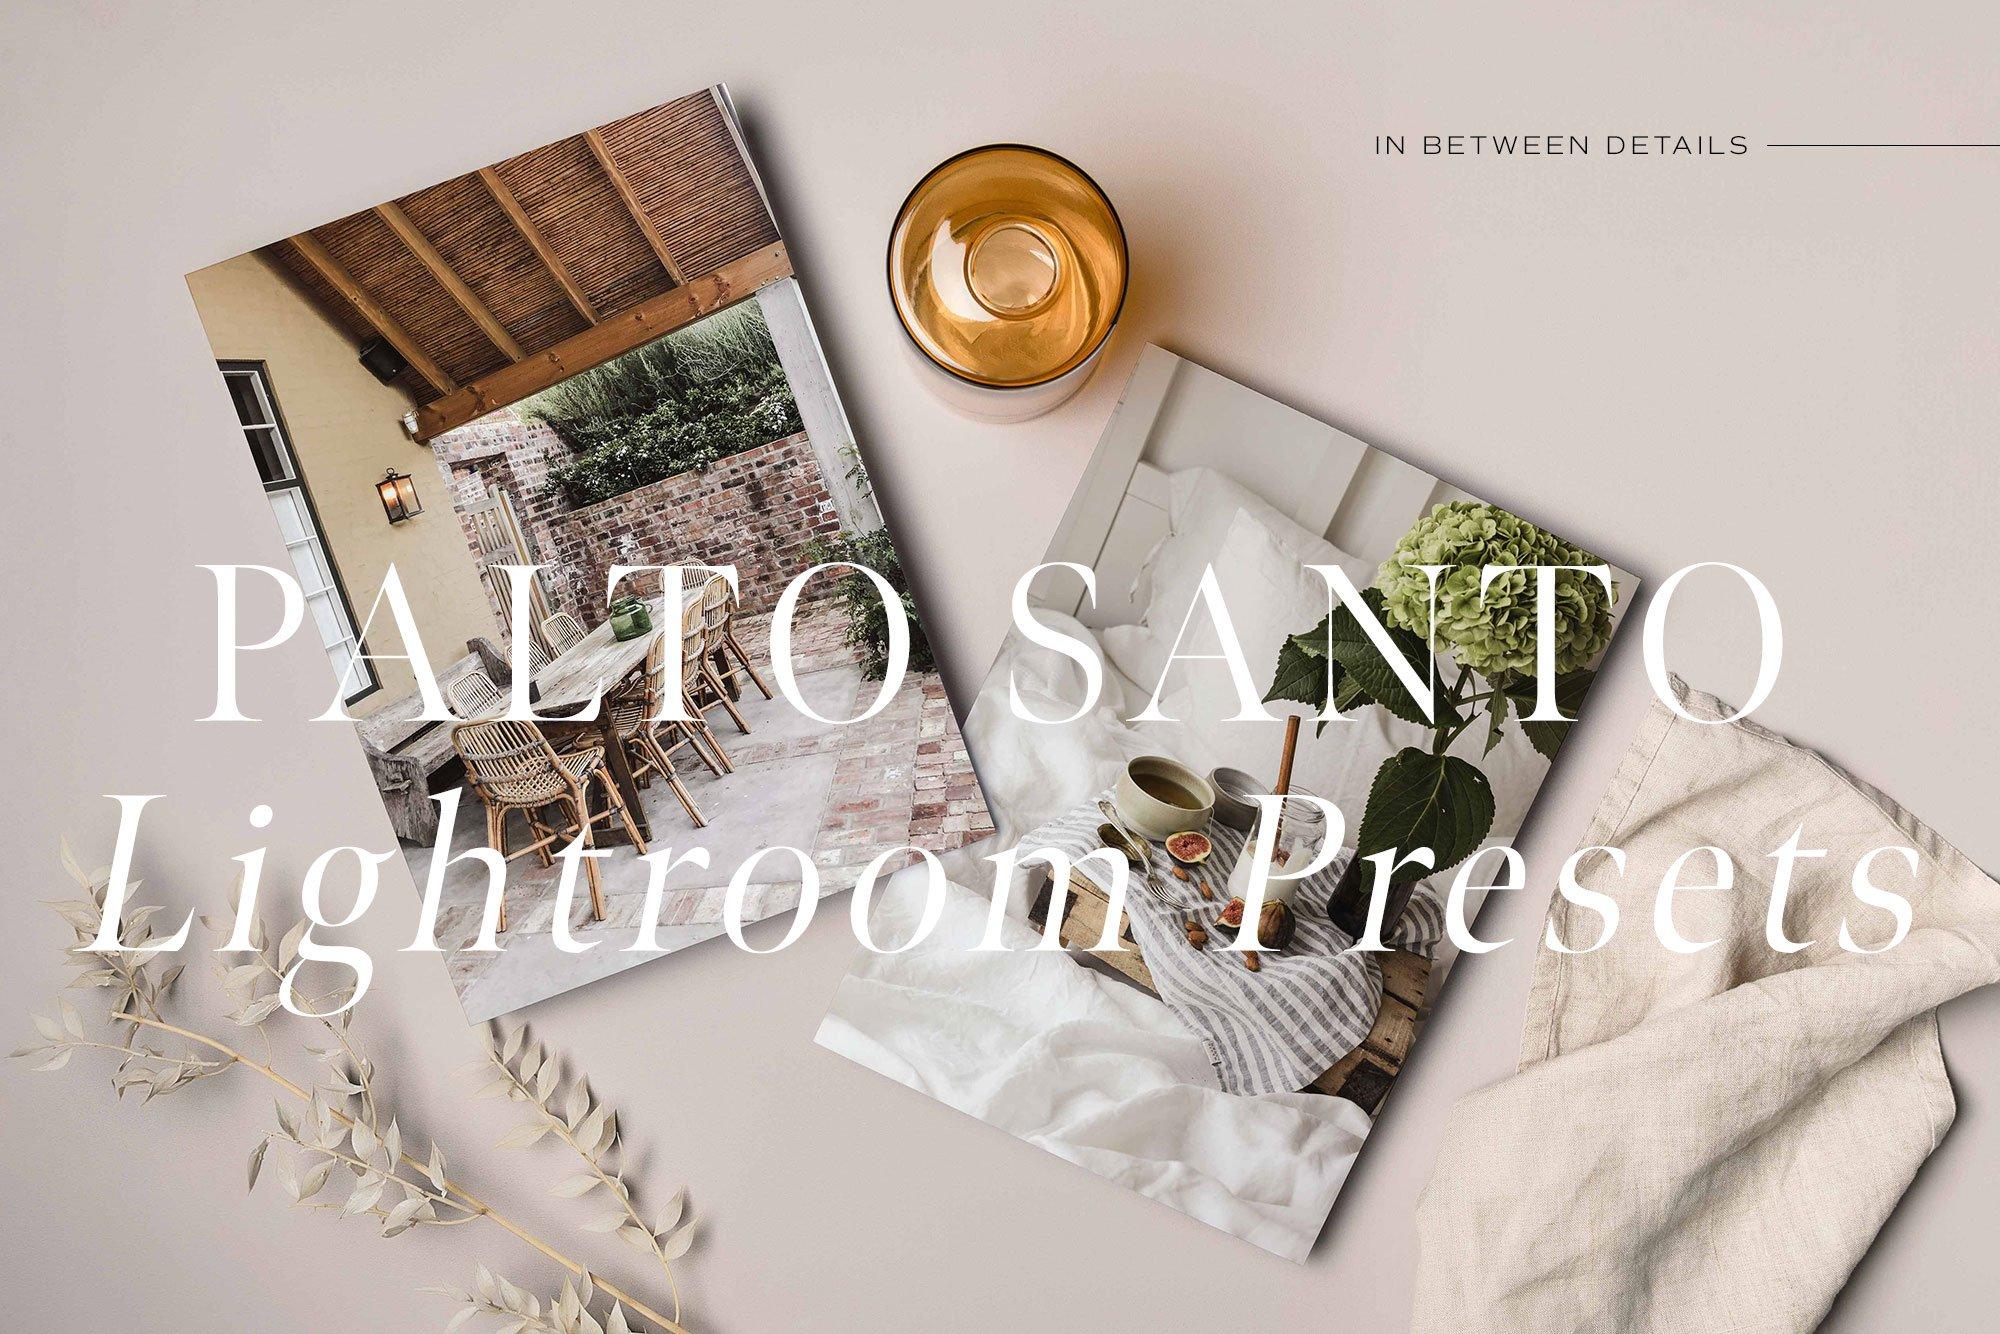 Palo Santo Lightroom Presets